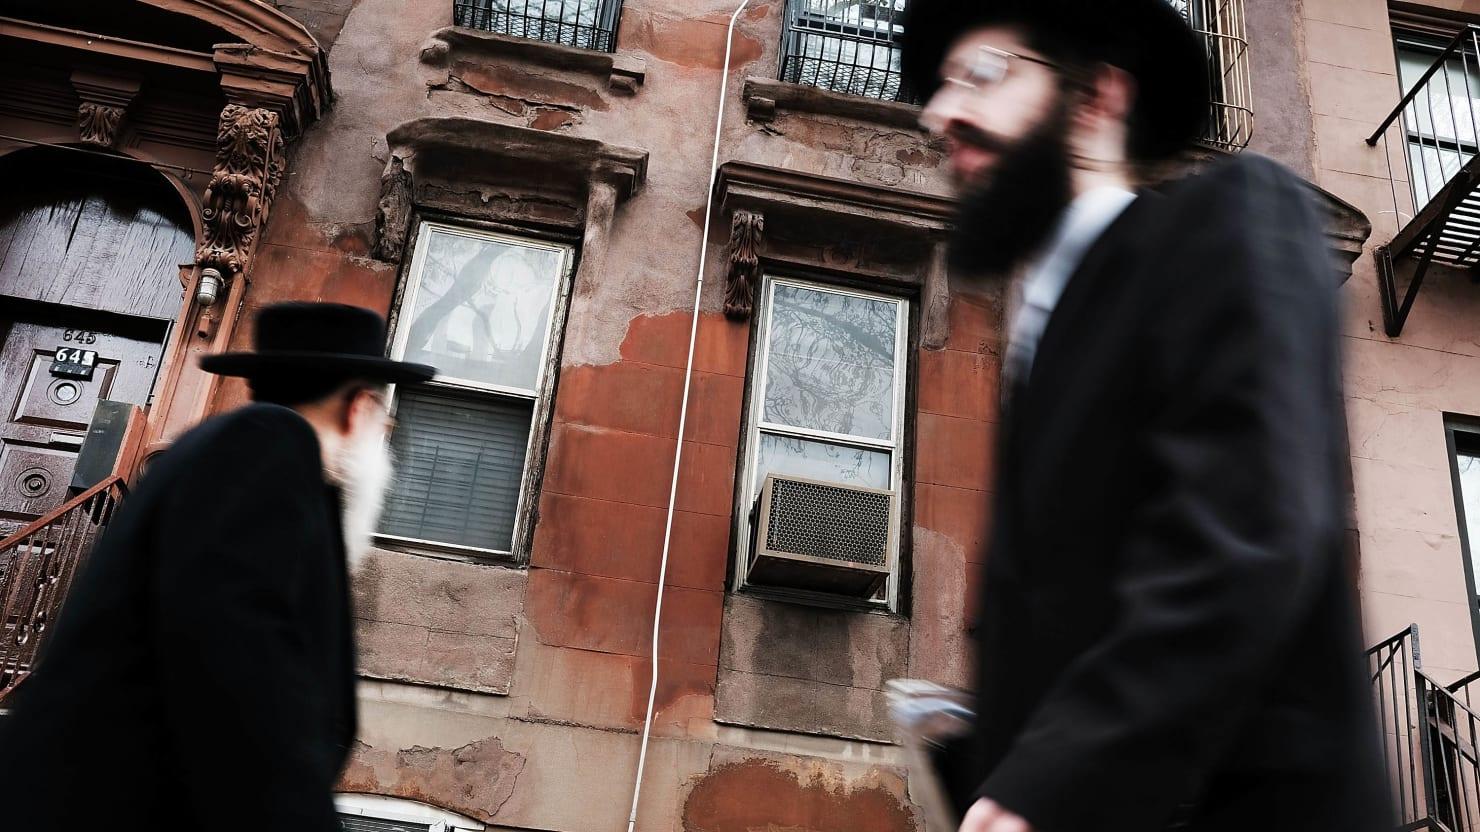 hasidic men walking through a jewish orthodox neighborhood in williamsburg brooklyn measles mmr vaccine anti vaxxer vaccination